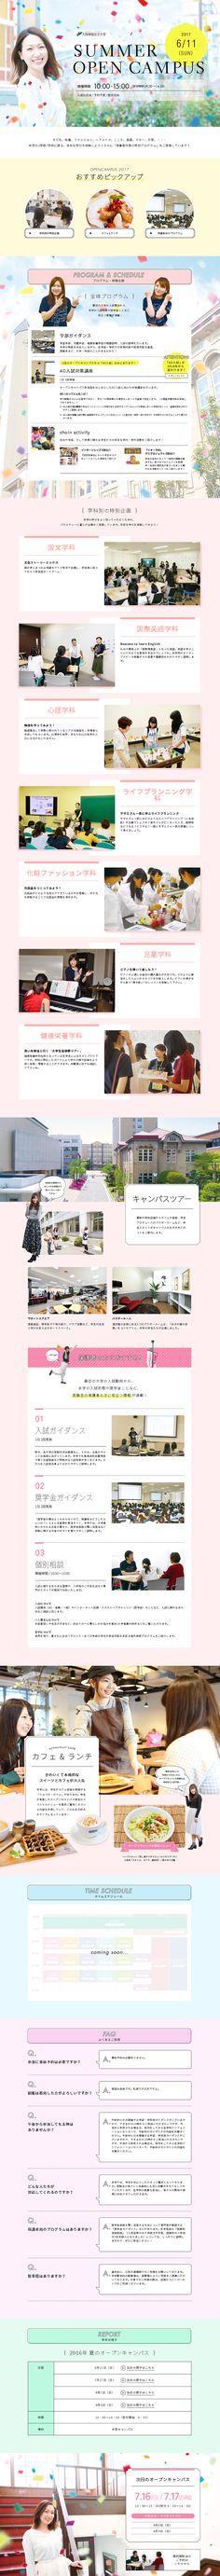 SUMMER OPEN CAMPUS|WEBデザイナーさん必見!ランディングページのデザイン参考に(かわいい系)